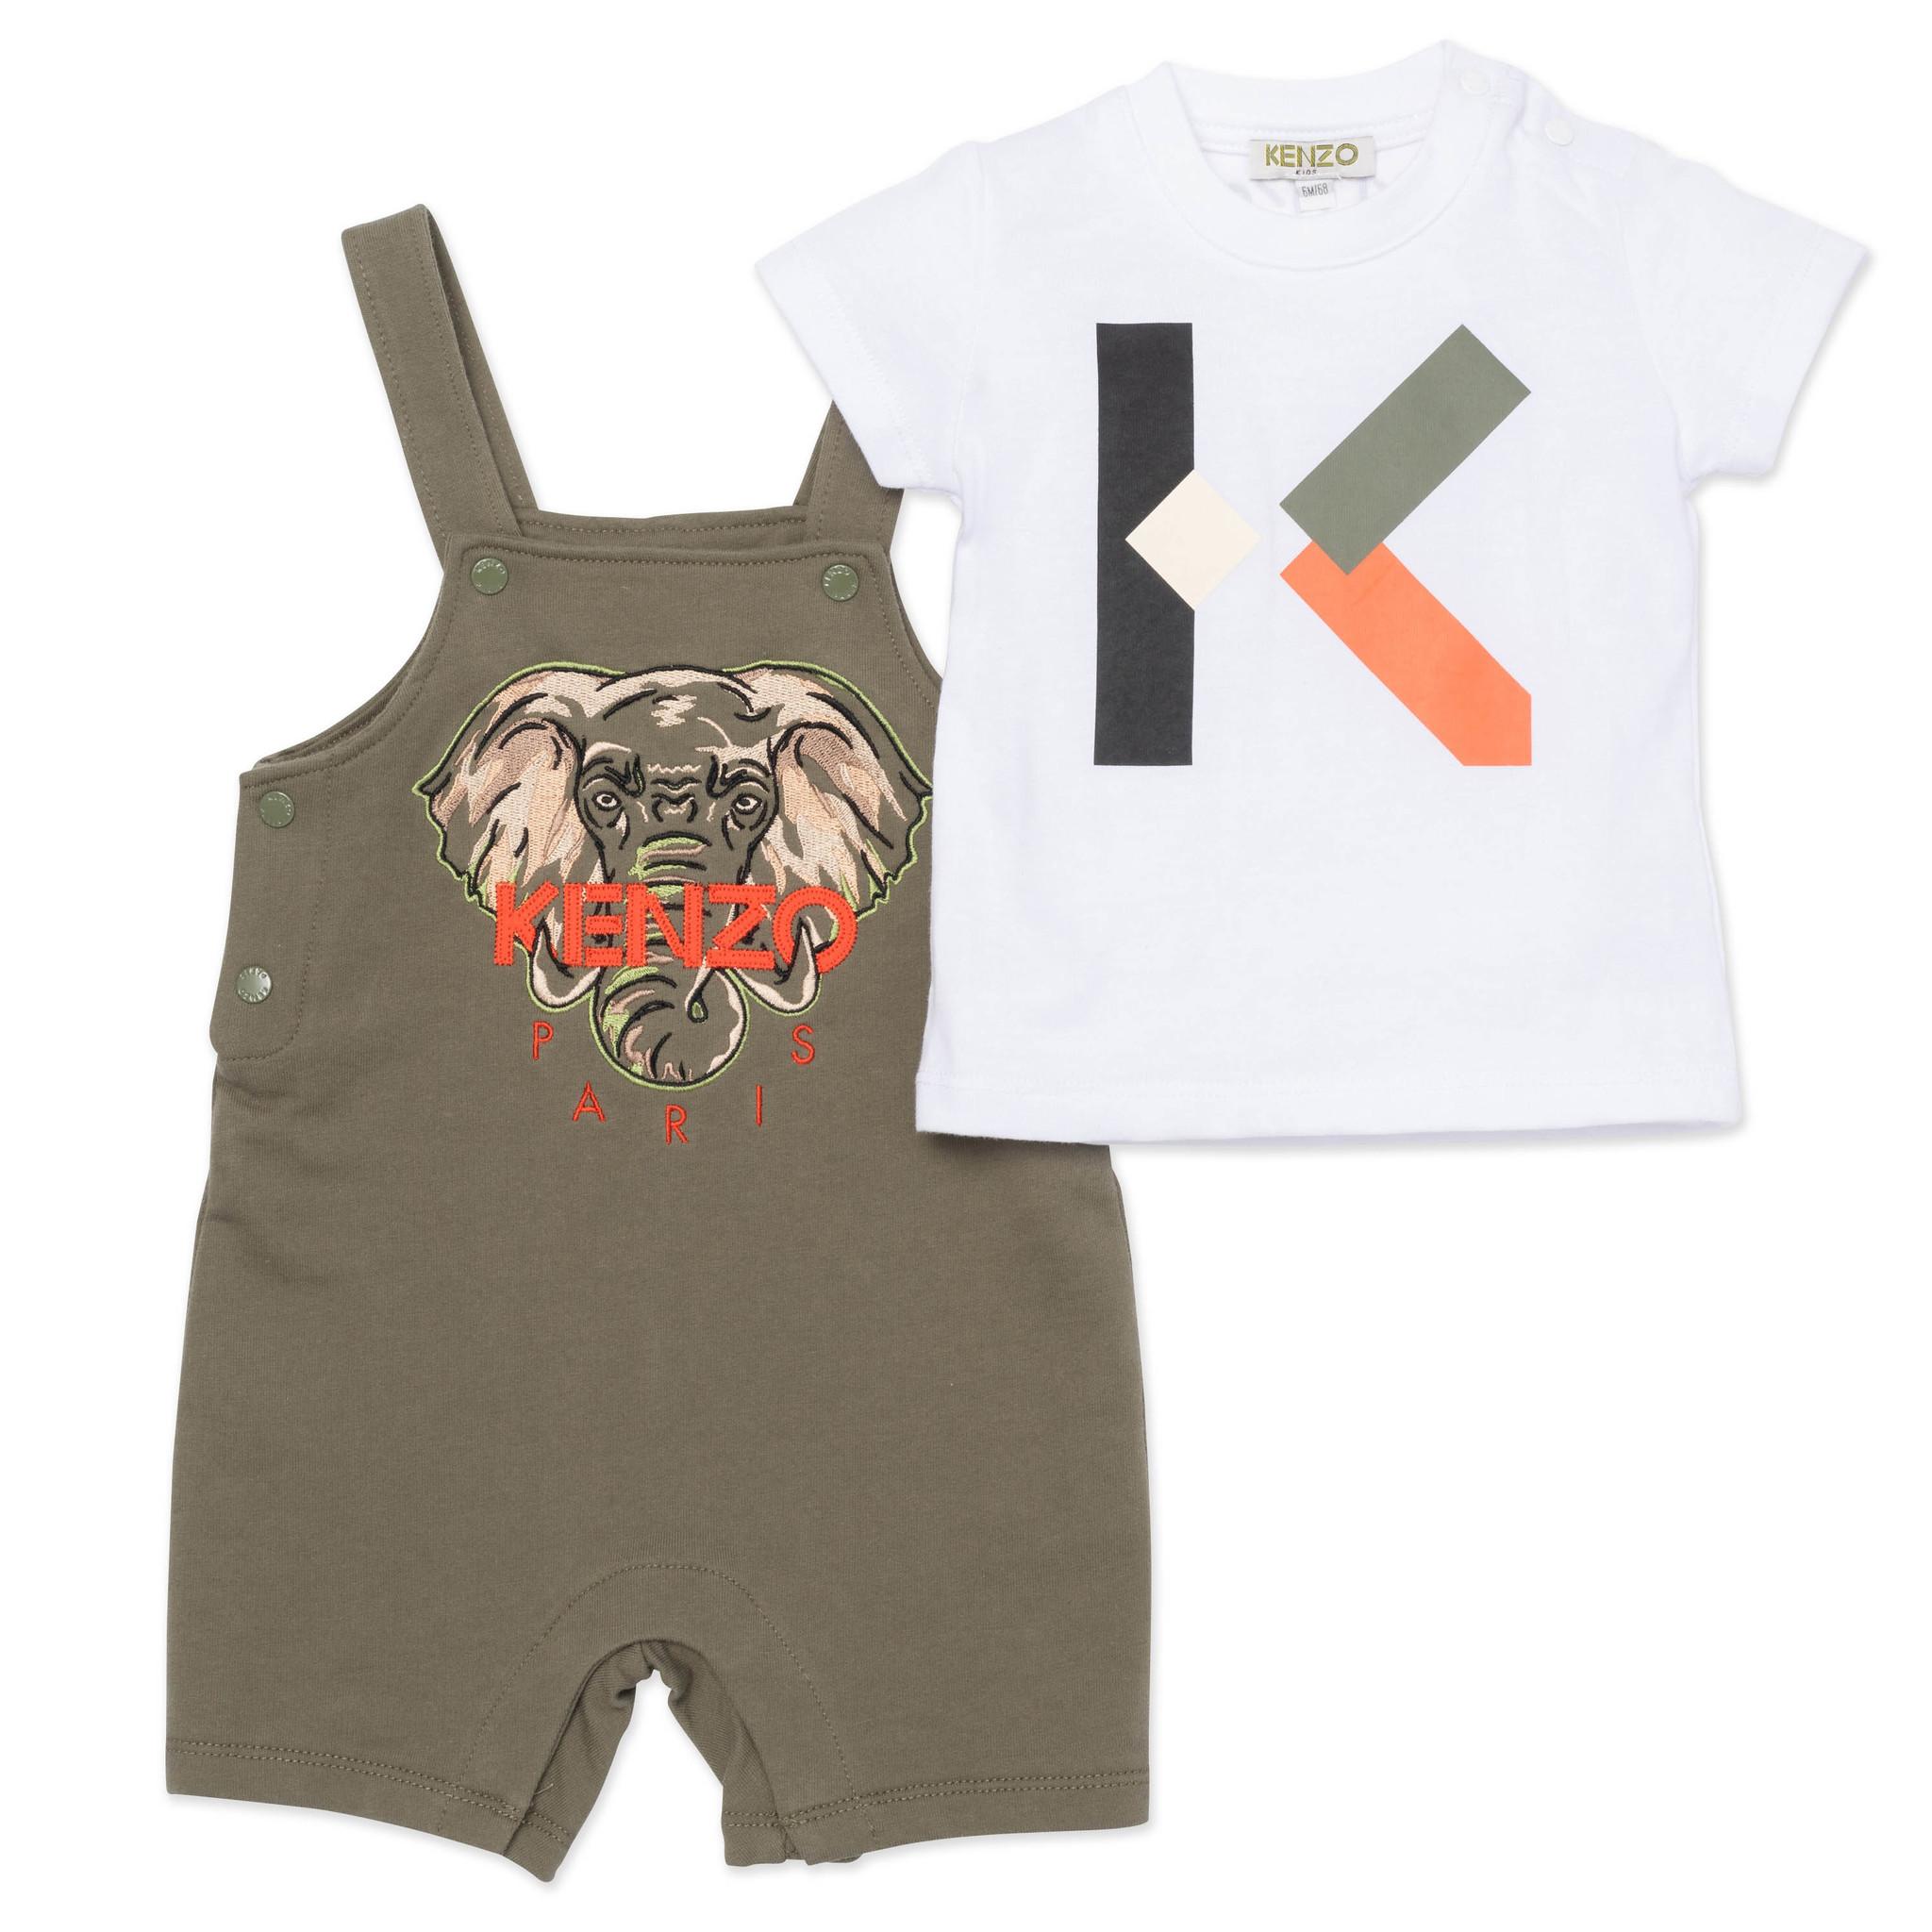 KENZO KIDS ensemble t shirt et salopette-1